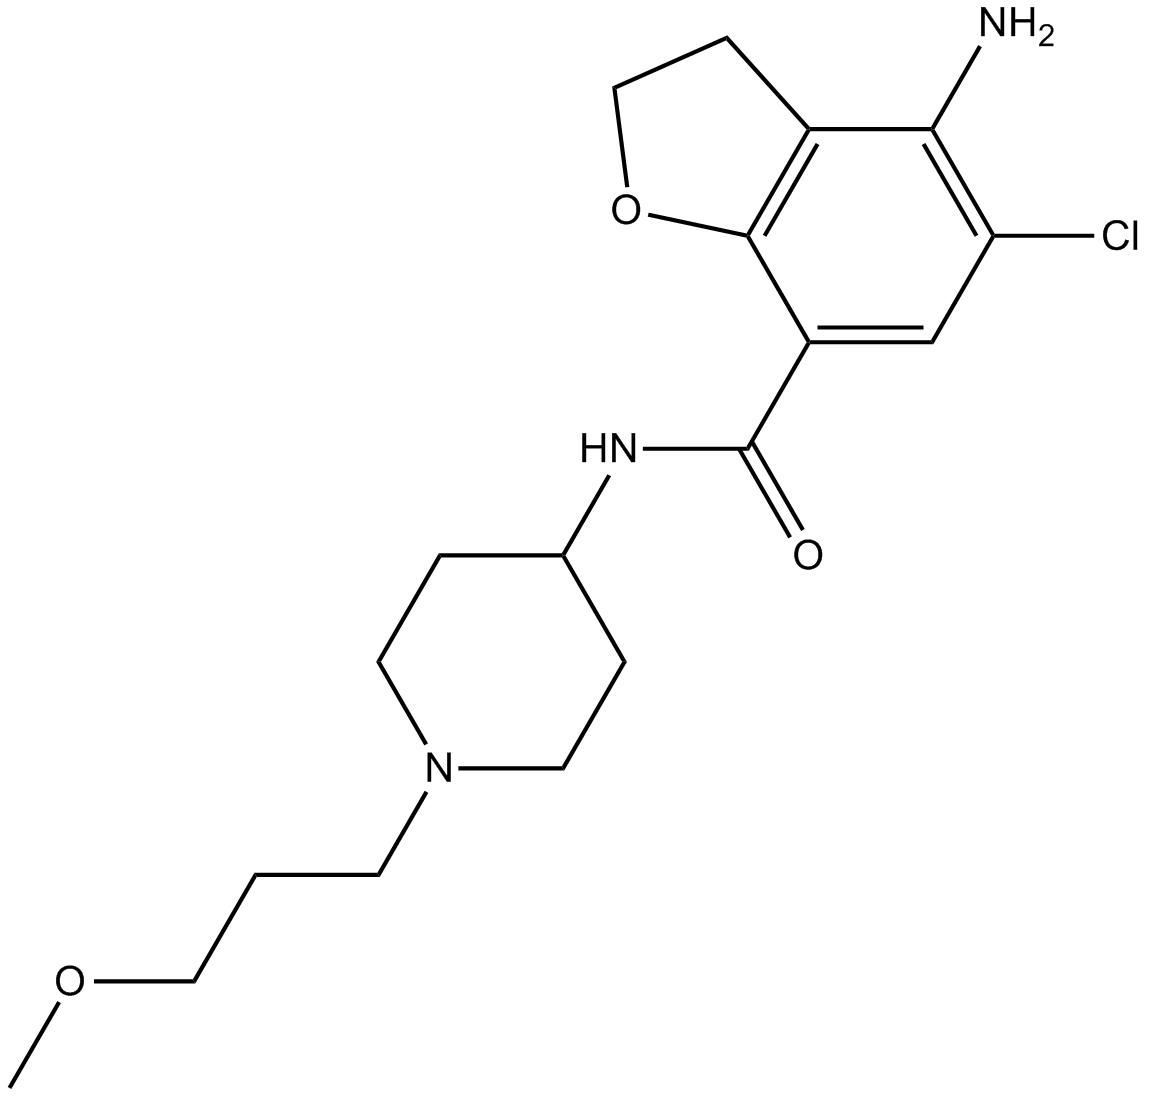 Prucalopride